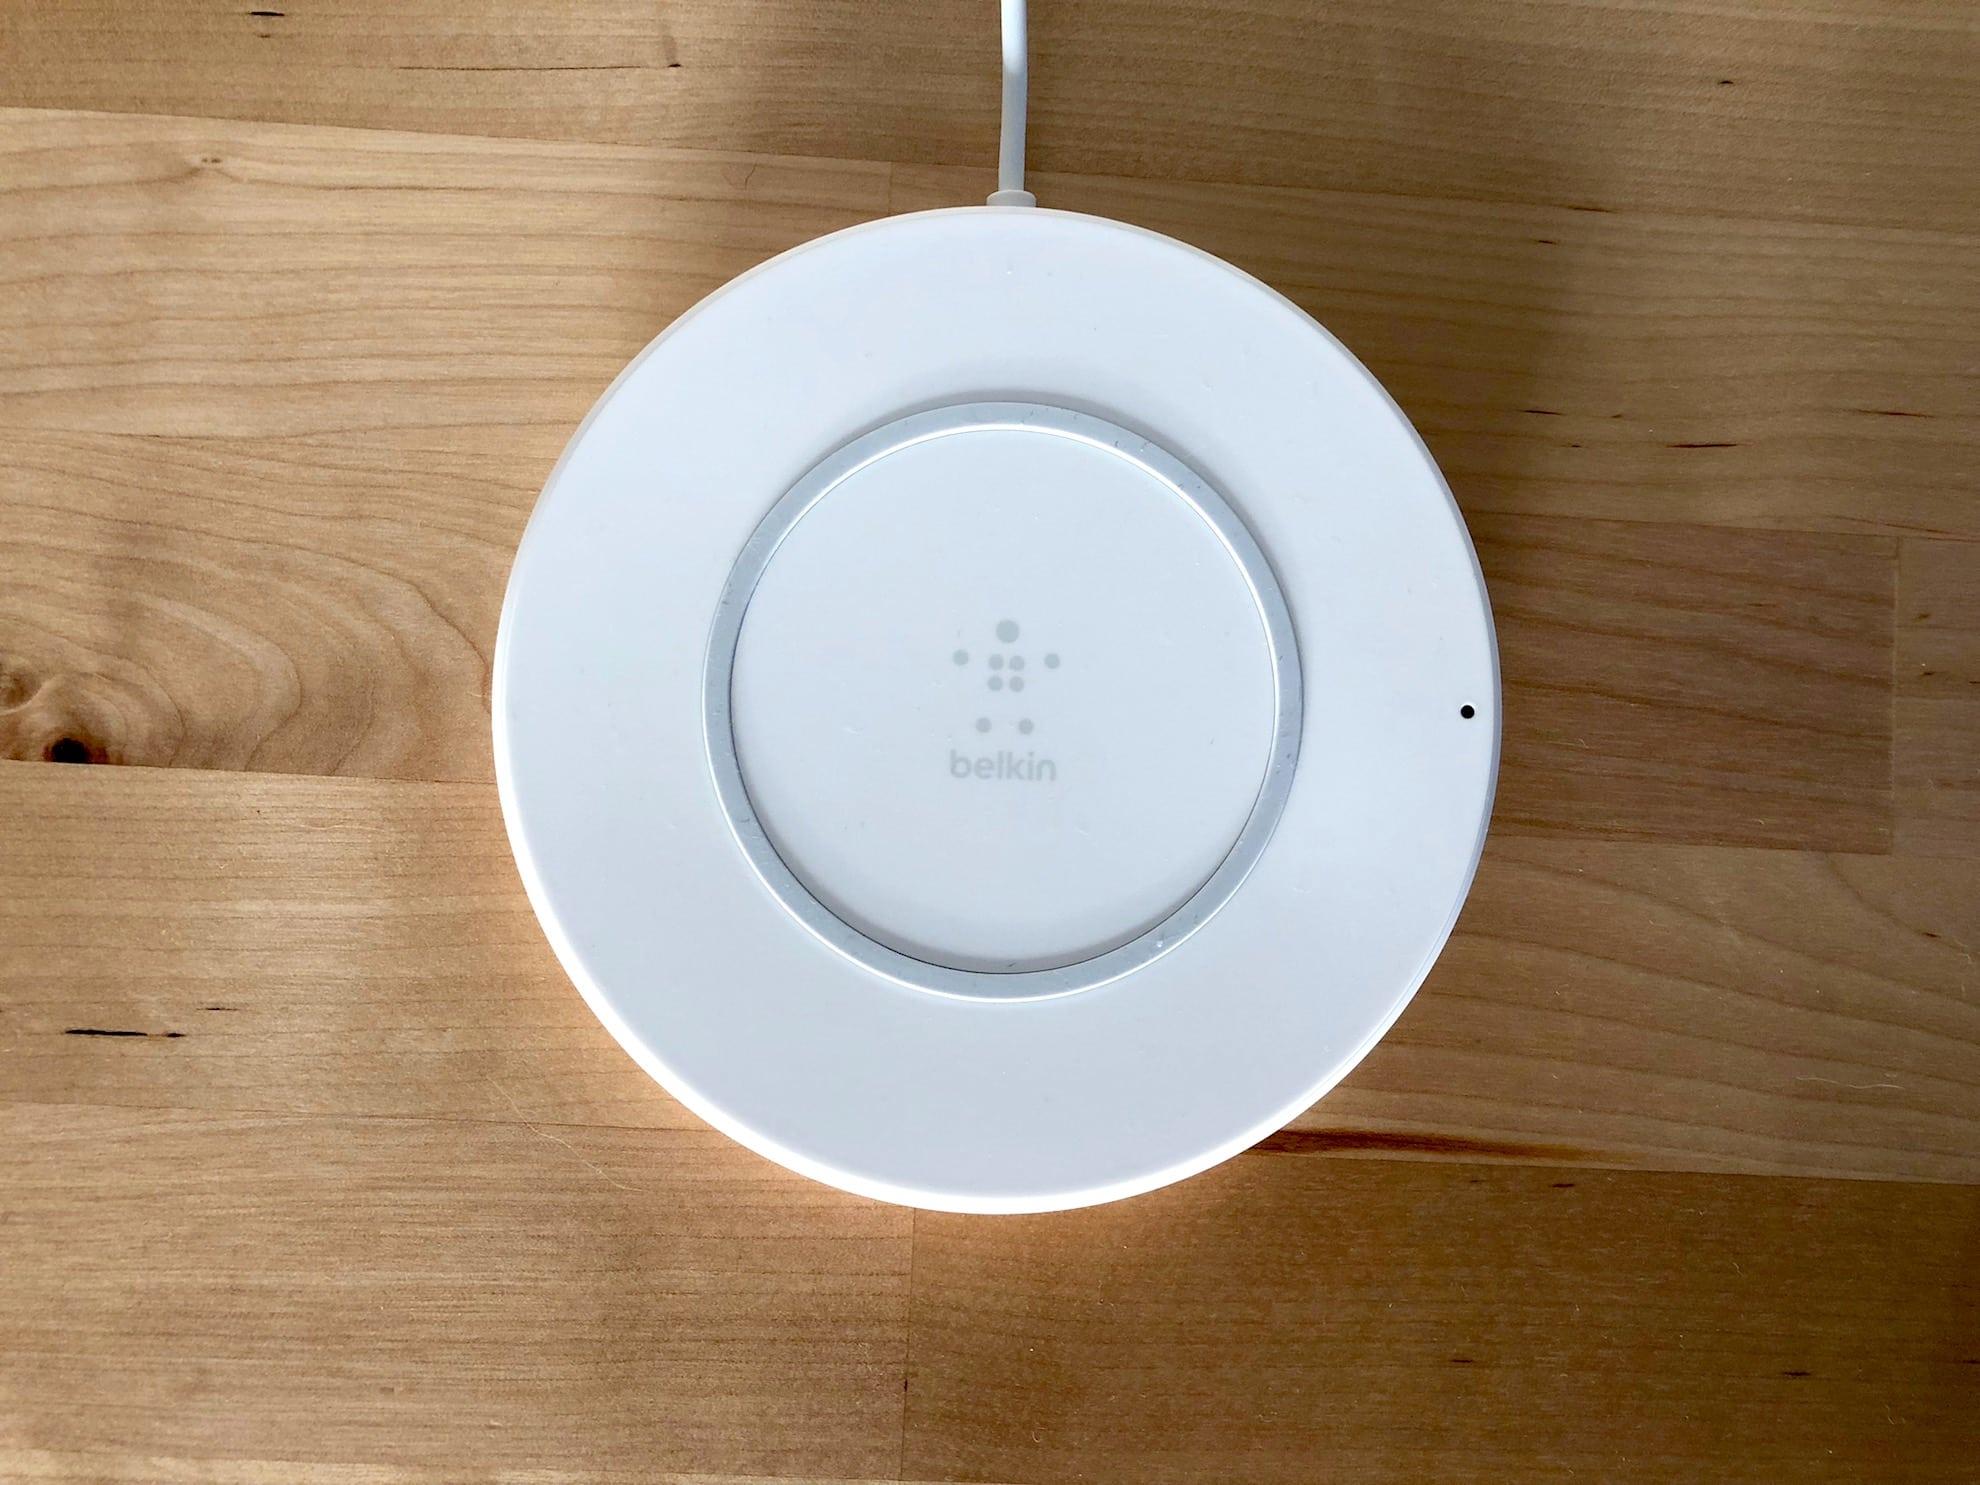 test du chargeur induction belkin boostup pour iphone thm magazine. Black Bedroom Furniture Sets. Home Design Ideas